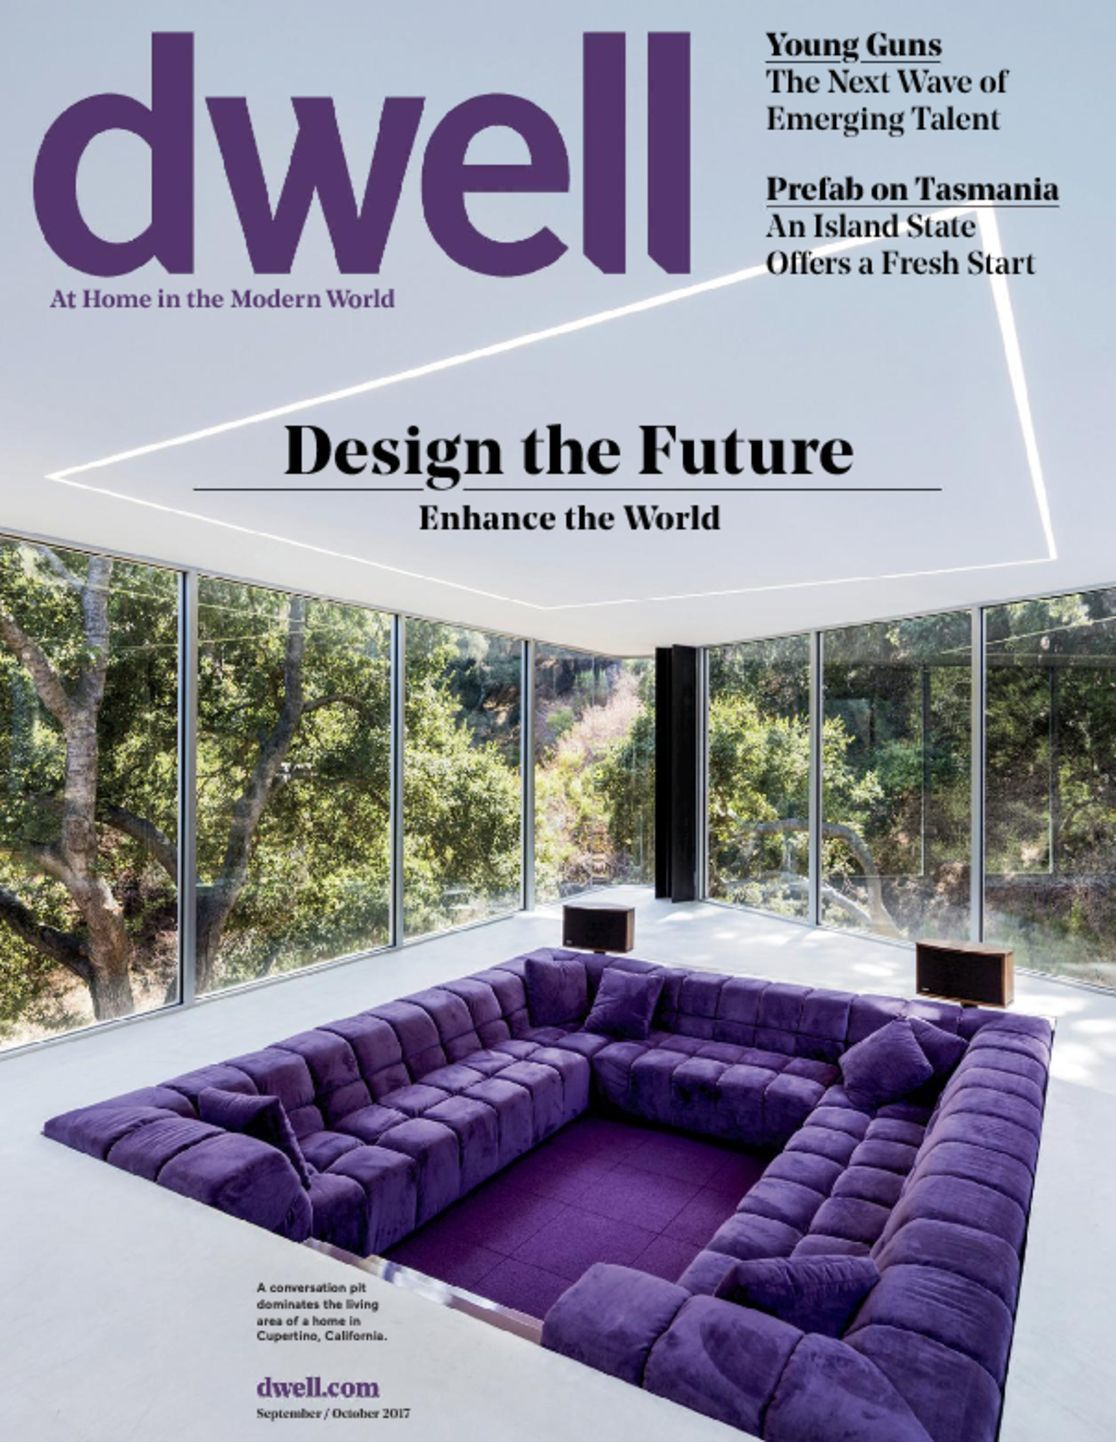 Pin De Jamie Myers Em Listening Space Em 2020 Arquitetura Casas Design De Interiores Casa Design De Casa Minimalista #purple #couches #living #room